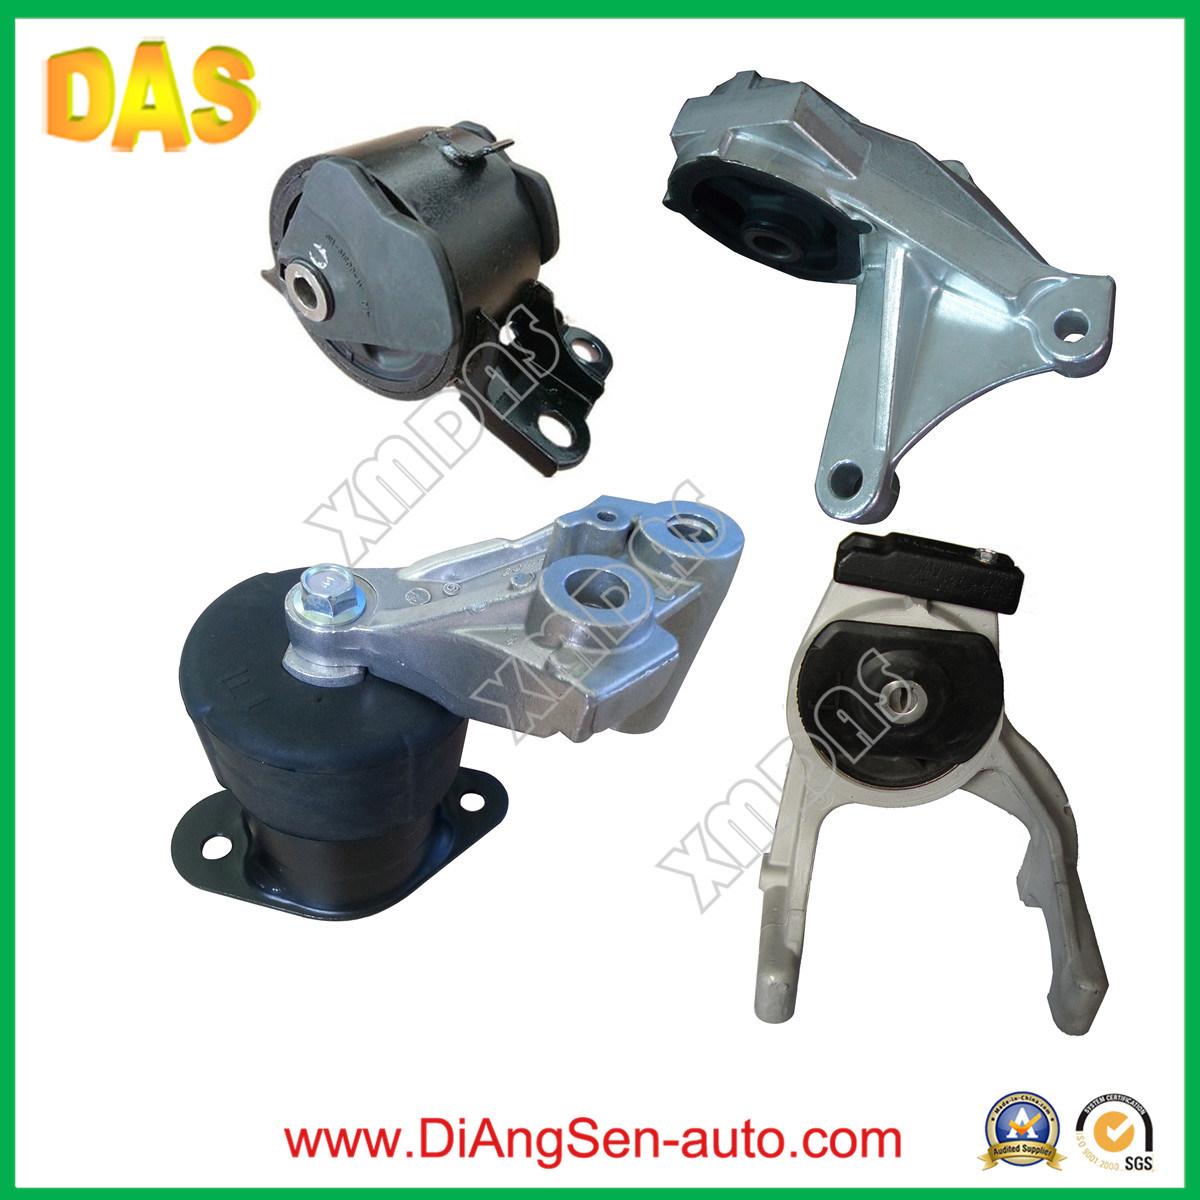 Car/Auto Rubber Spare Parts for Honda Odyssey Engine Mount (50810-SFE-020, 50820-SFE-J00, 50830-SFE-000, 50850-SFE-003)